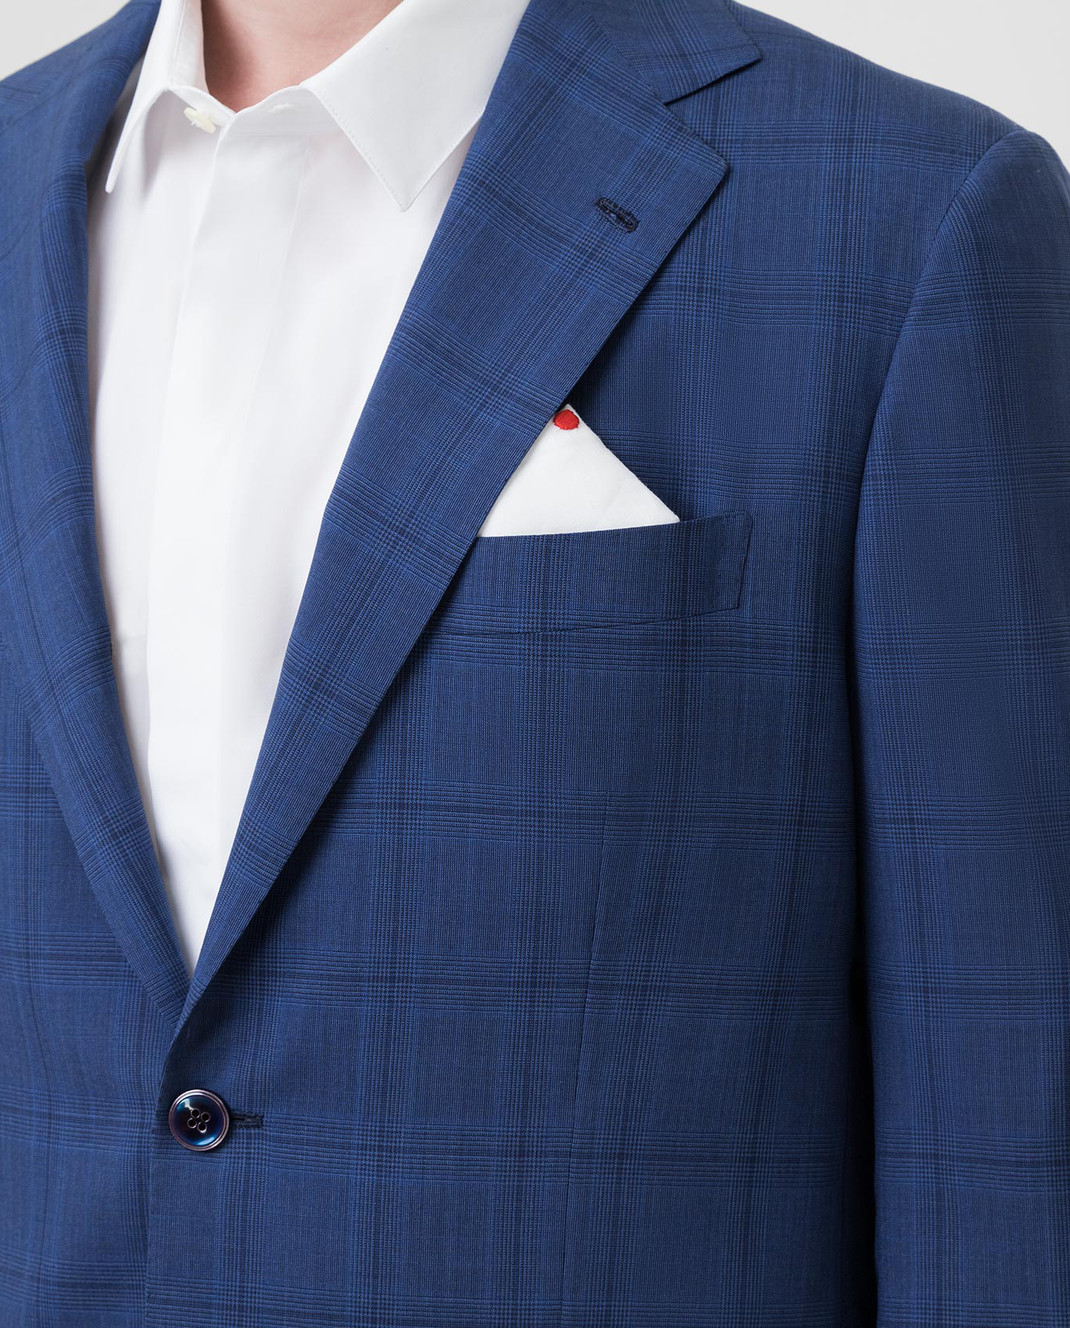 Kiton Темно-синий костюм из шерсти изображение 5